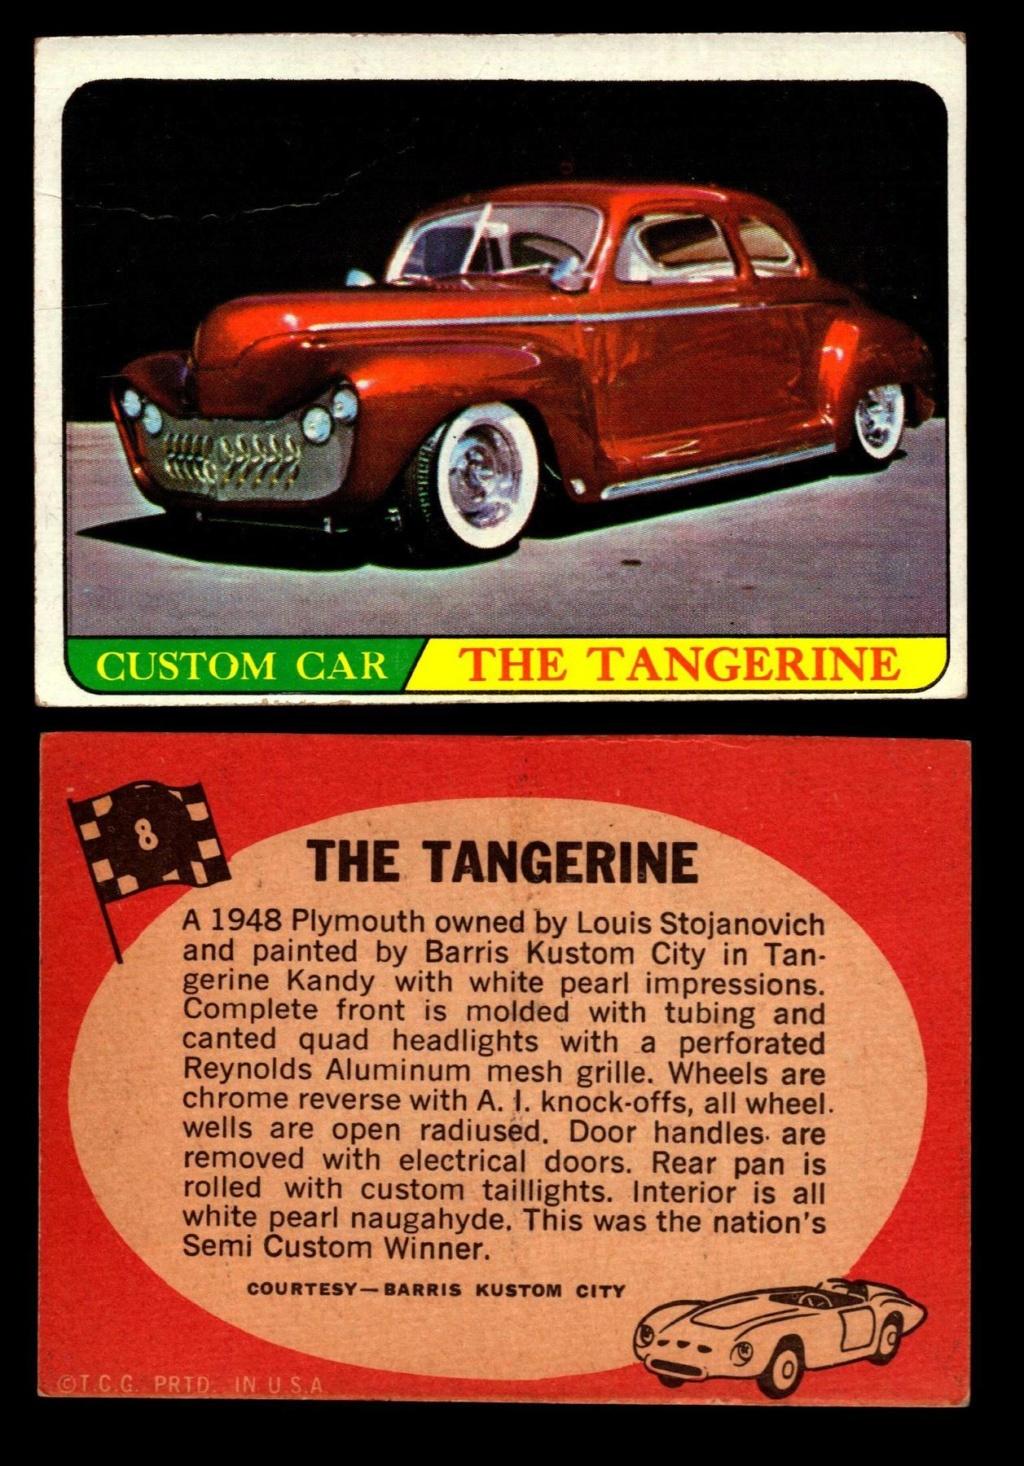 Hot Rods Topps - Vintage Trading Cards 1968 - Custom car - Dragster - Racer - Dream car - Barris Kustom City - Ed Roth Darrill Starbird, Gene Winfield, Bill Cuchenberry 8_43d310